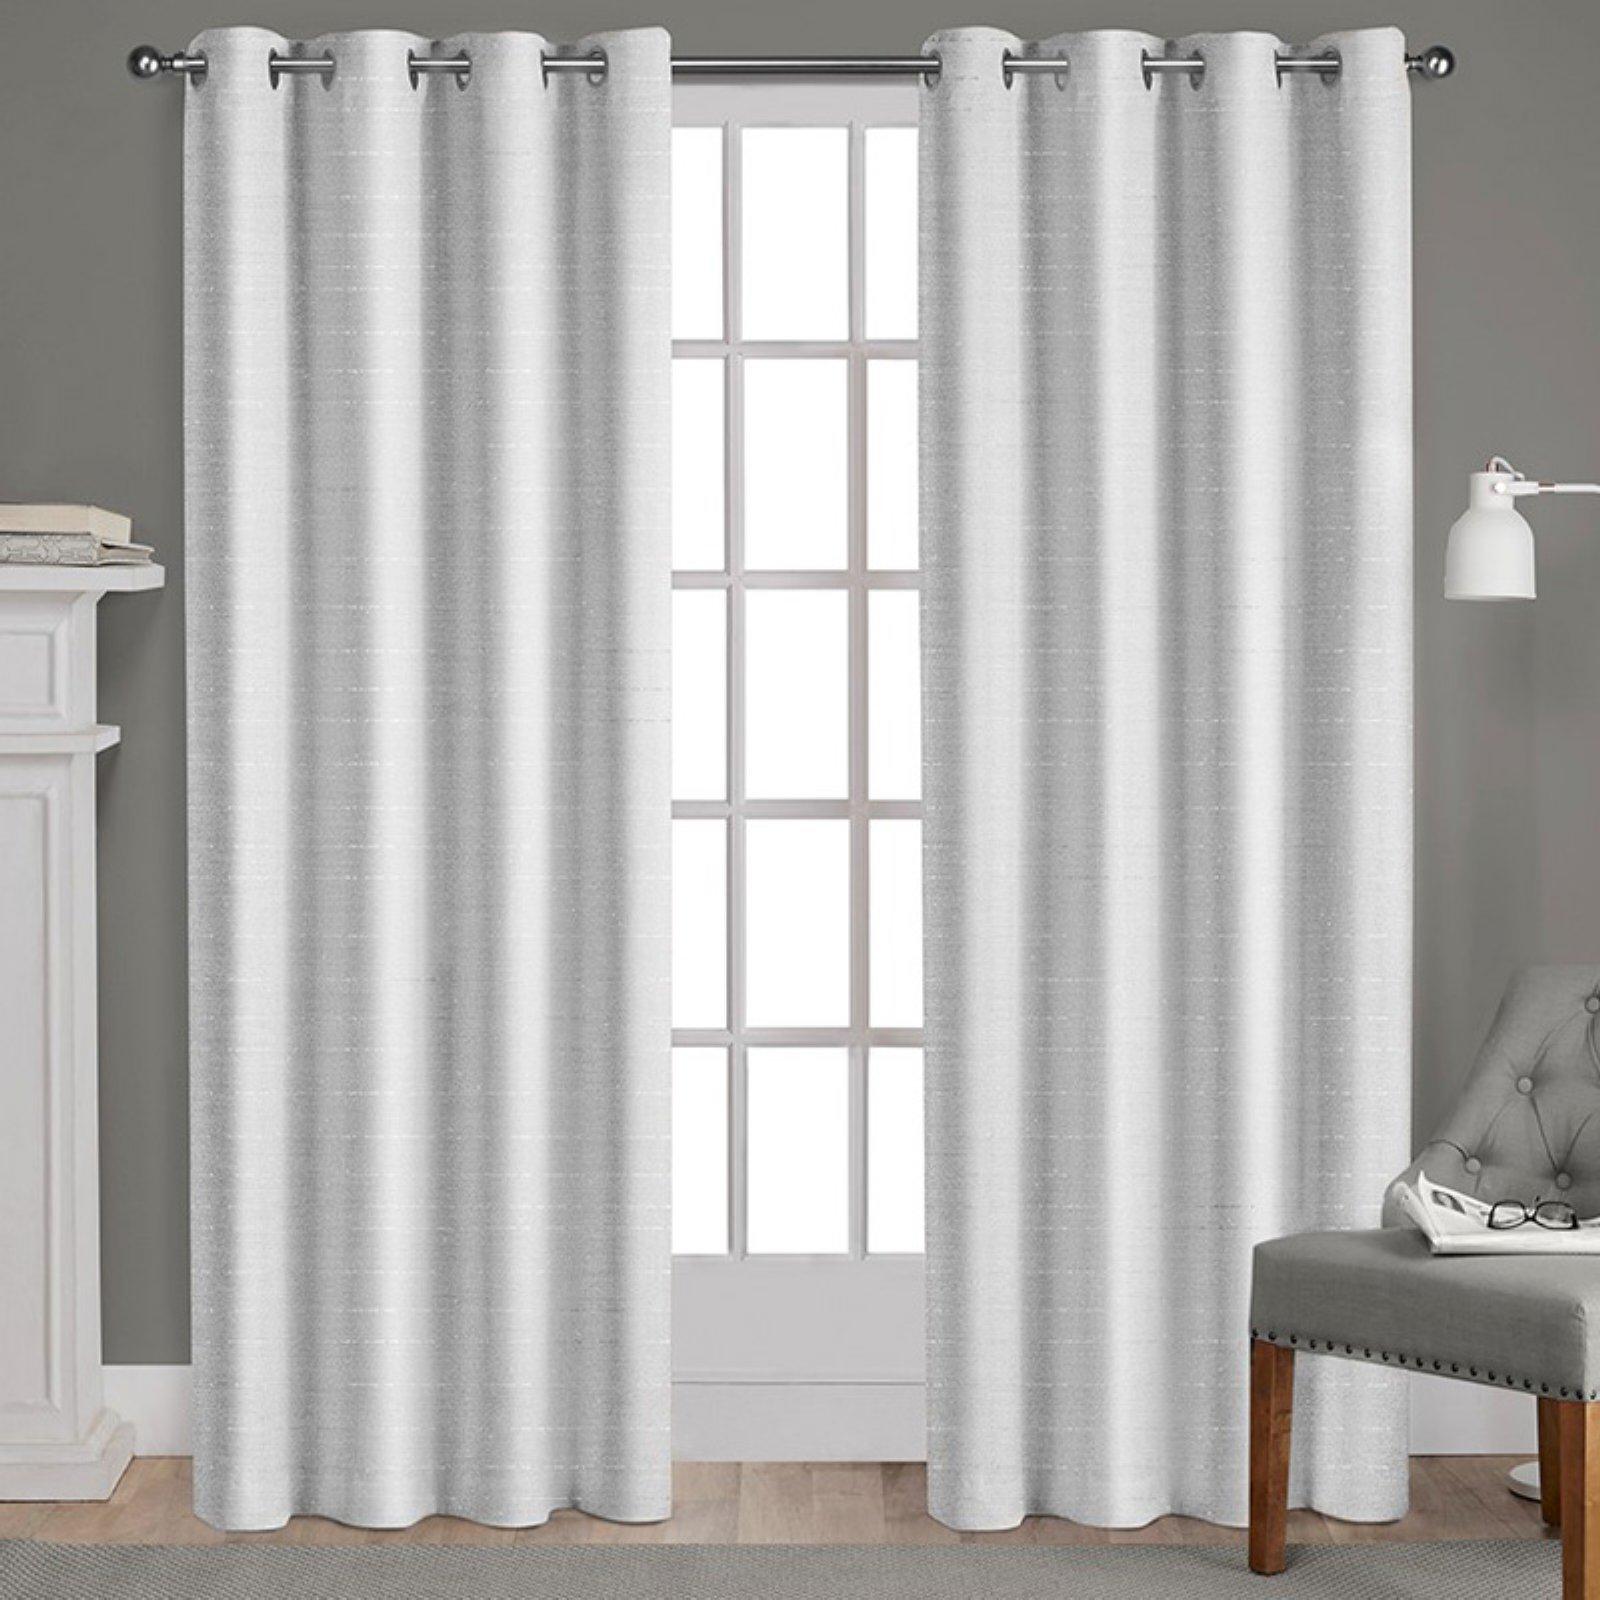 Recent Elegant Comfort Window Sheer Curtain Panel Pairs In Exclusive Home Whitby Metallic Slub Yarn Textured Silk Look (View 13 of 20)